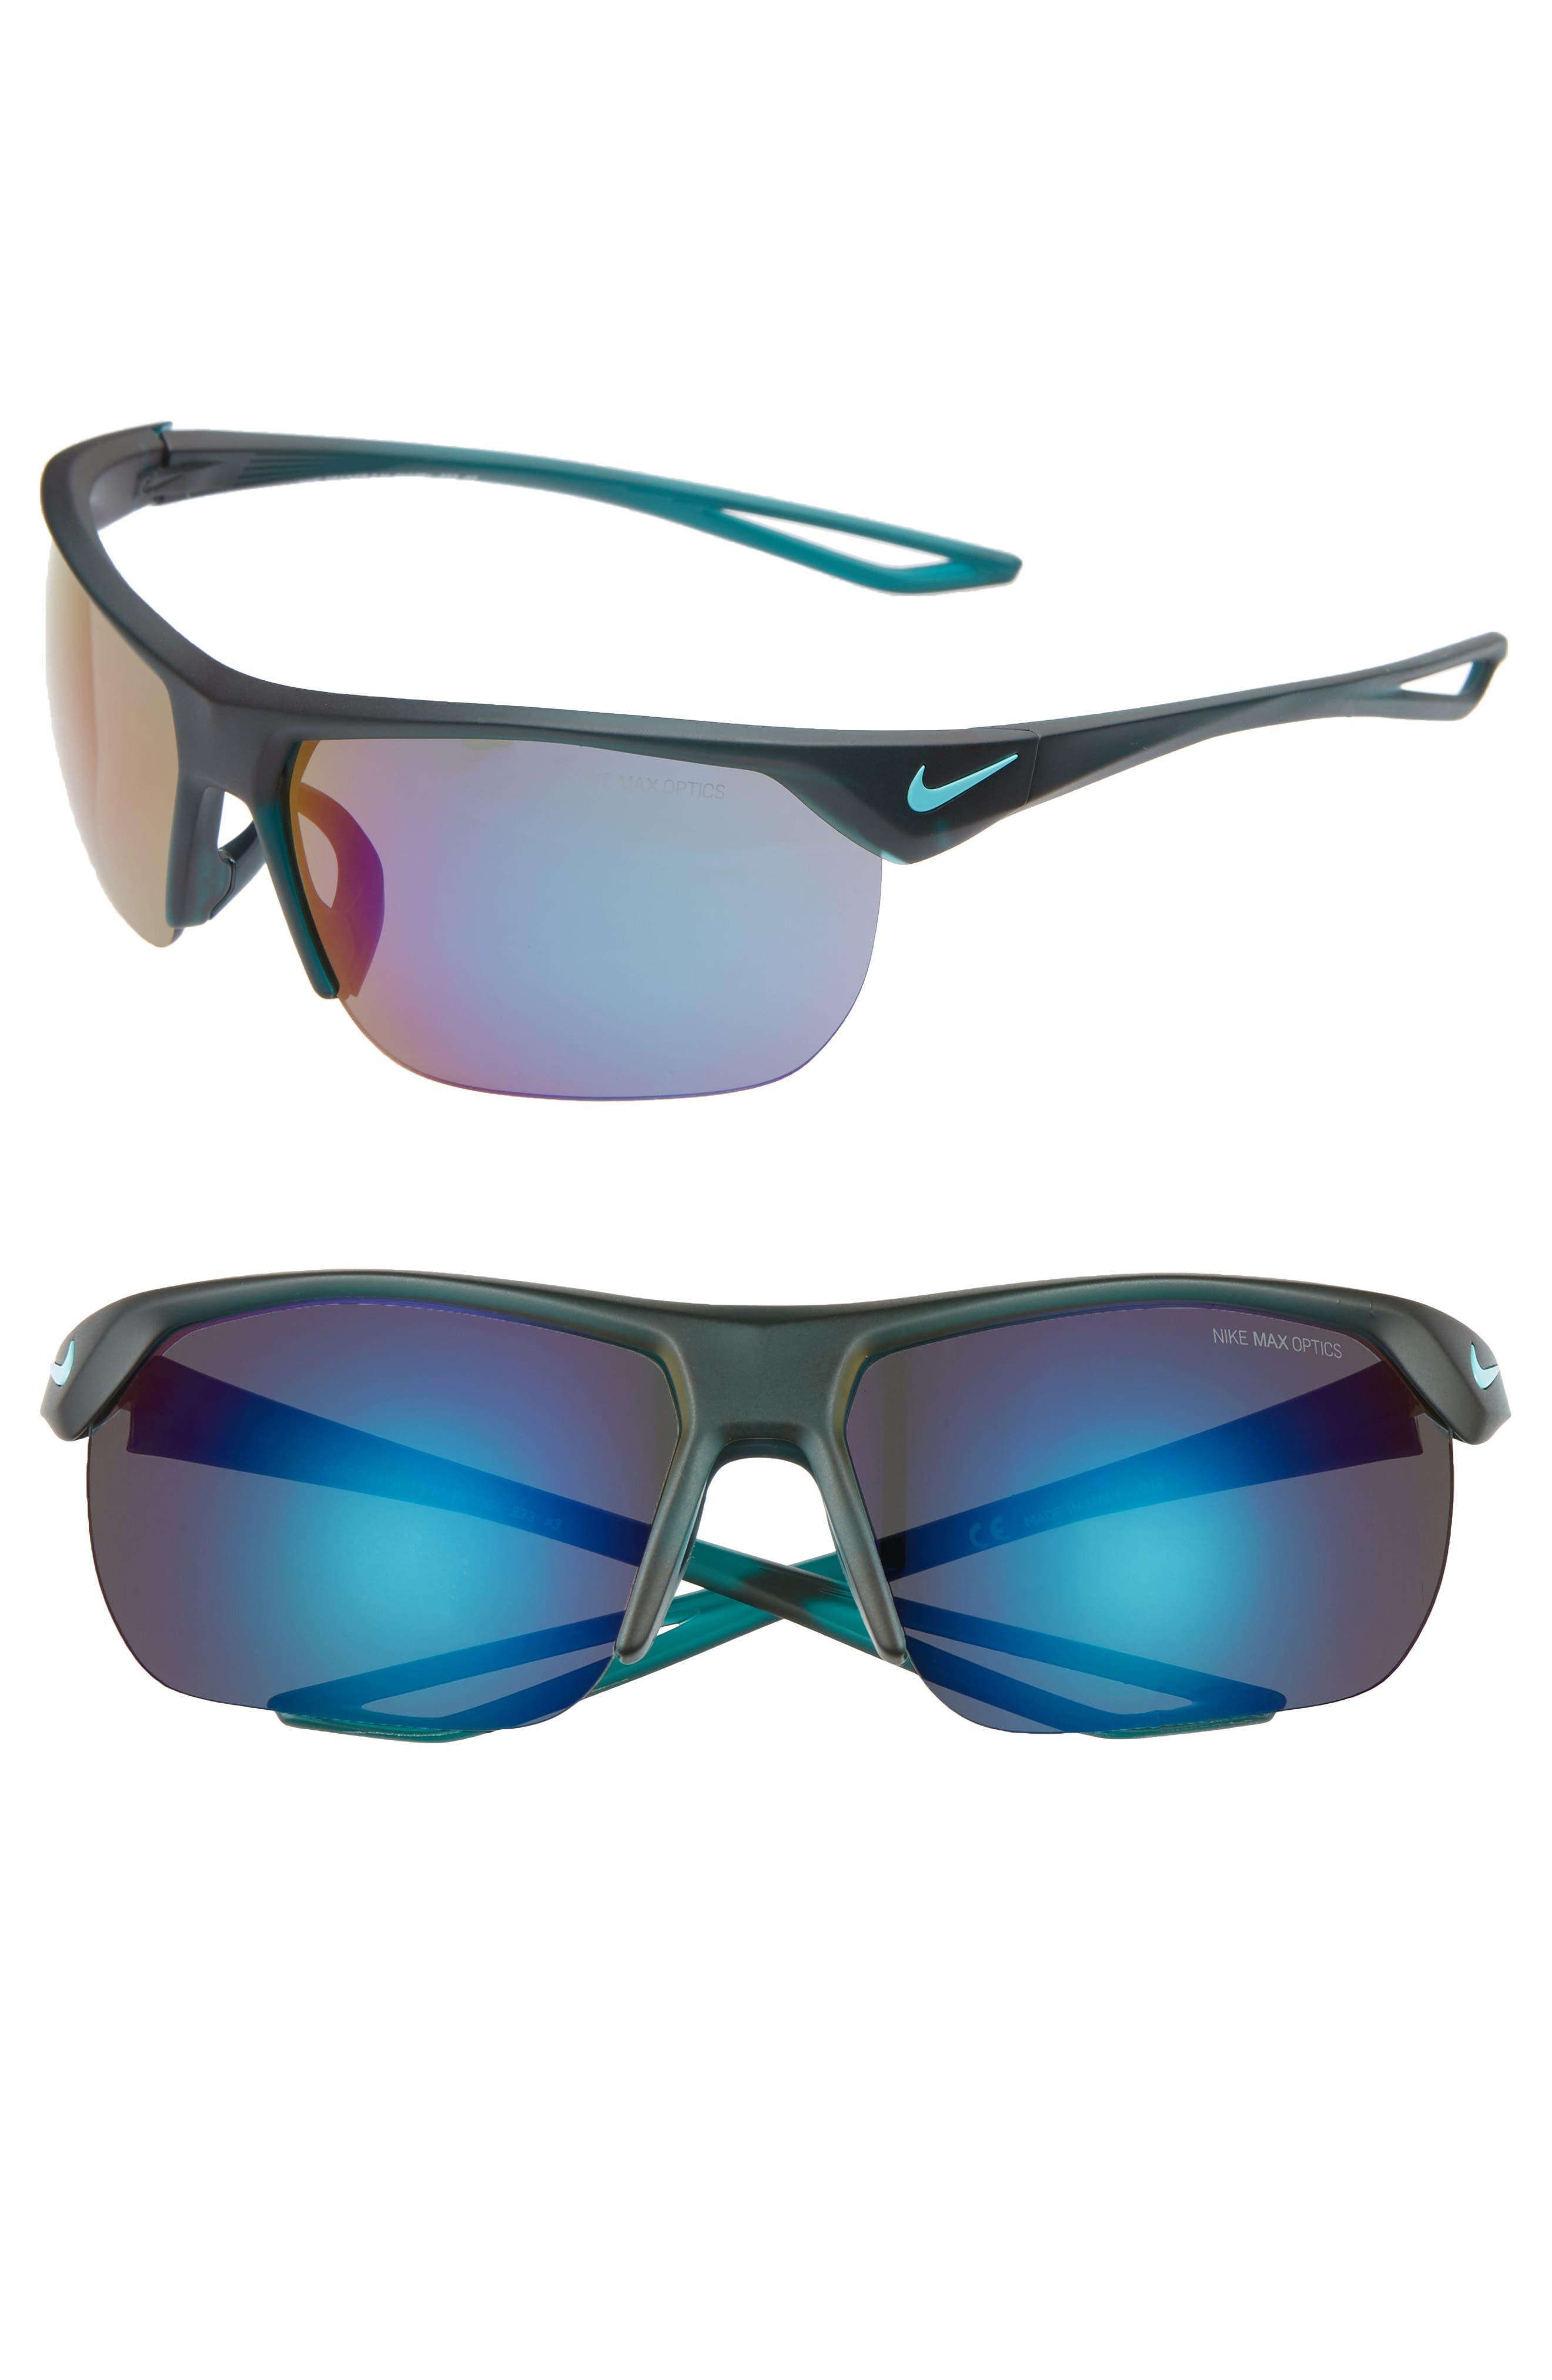 Nike Trainer 6m Mirrored Shield Sunglasses - Grey/ Dark Teal